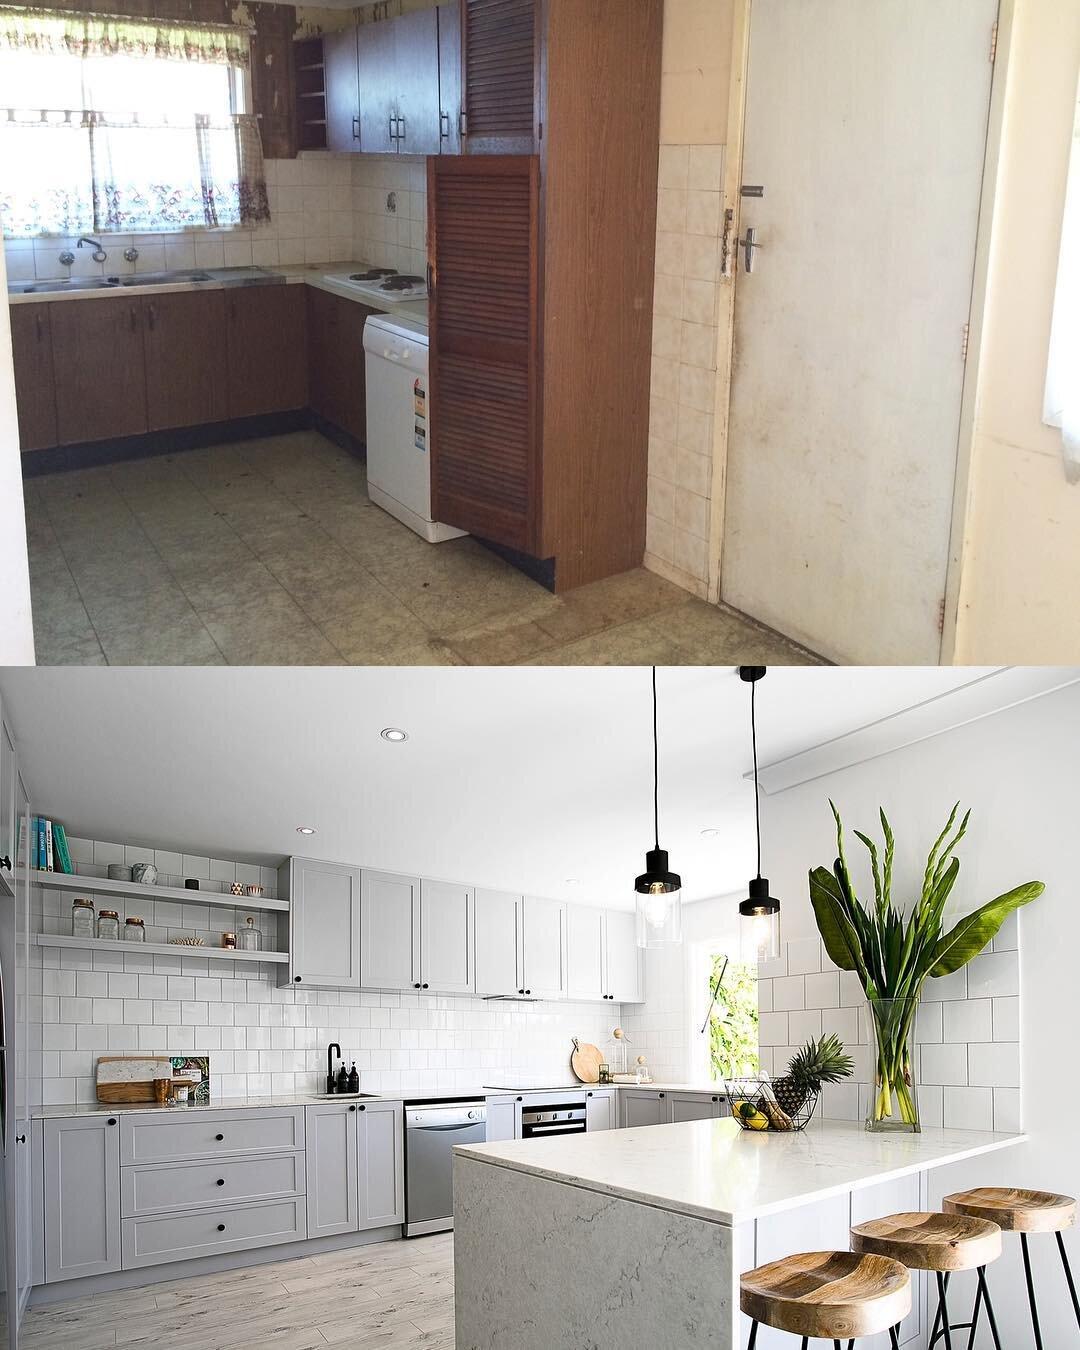 Doing home renovations to save energy